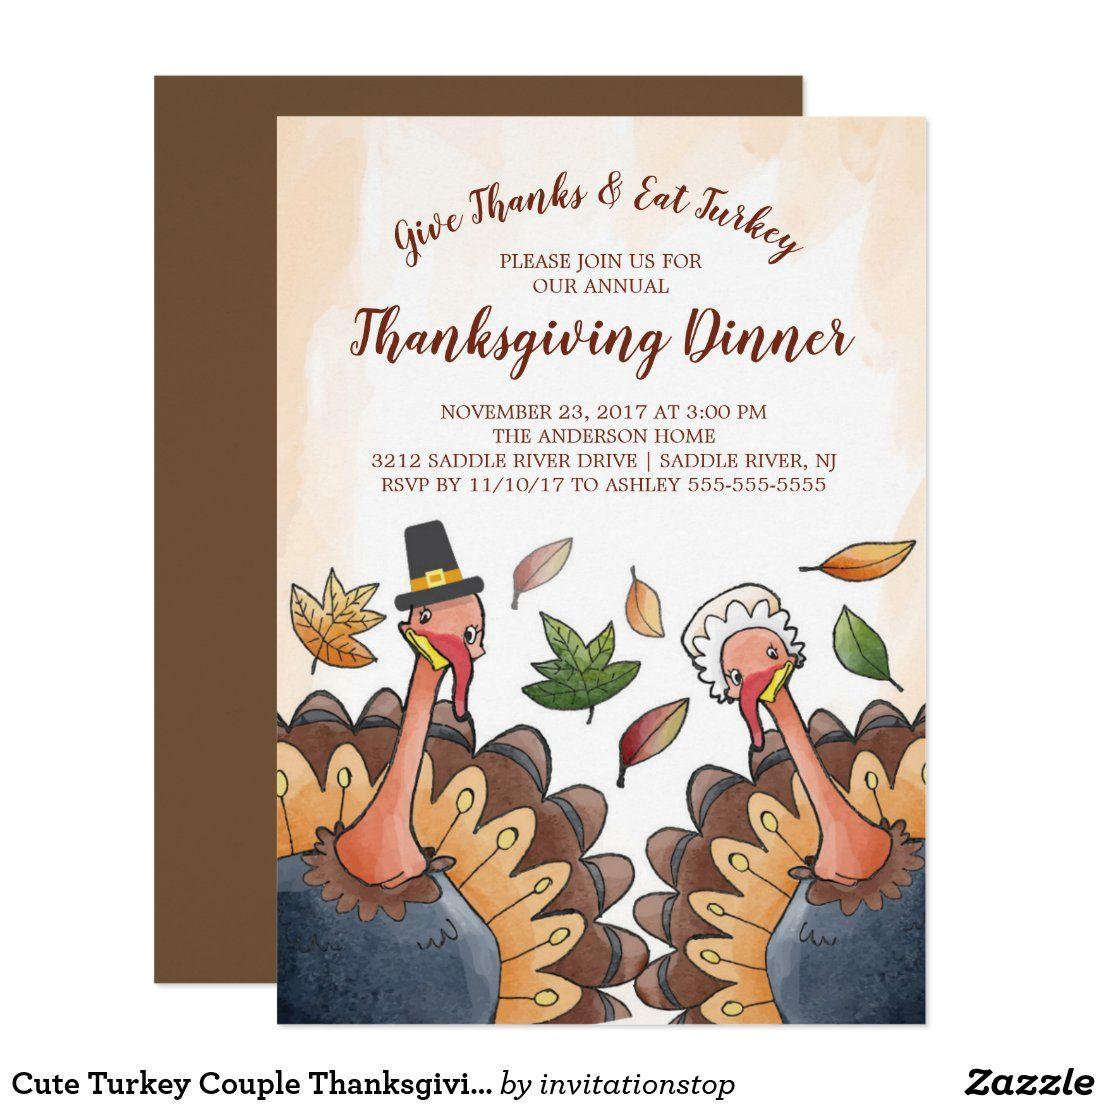 Cute Turkey Couple Thanksgiving Dinner Invitation Zazzle Com In 2020 Thanksgiving Dinner Invitation Thanksgiving Invitation Dinner Invitations